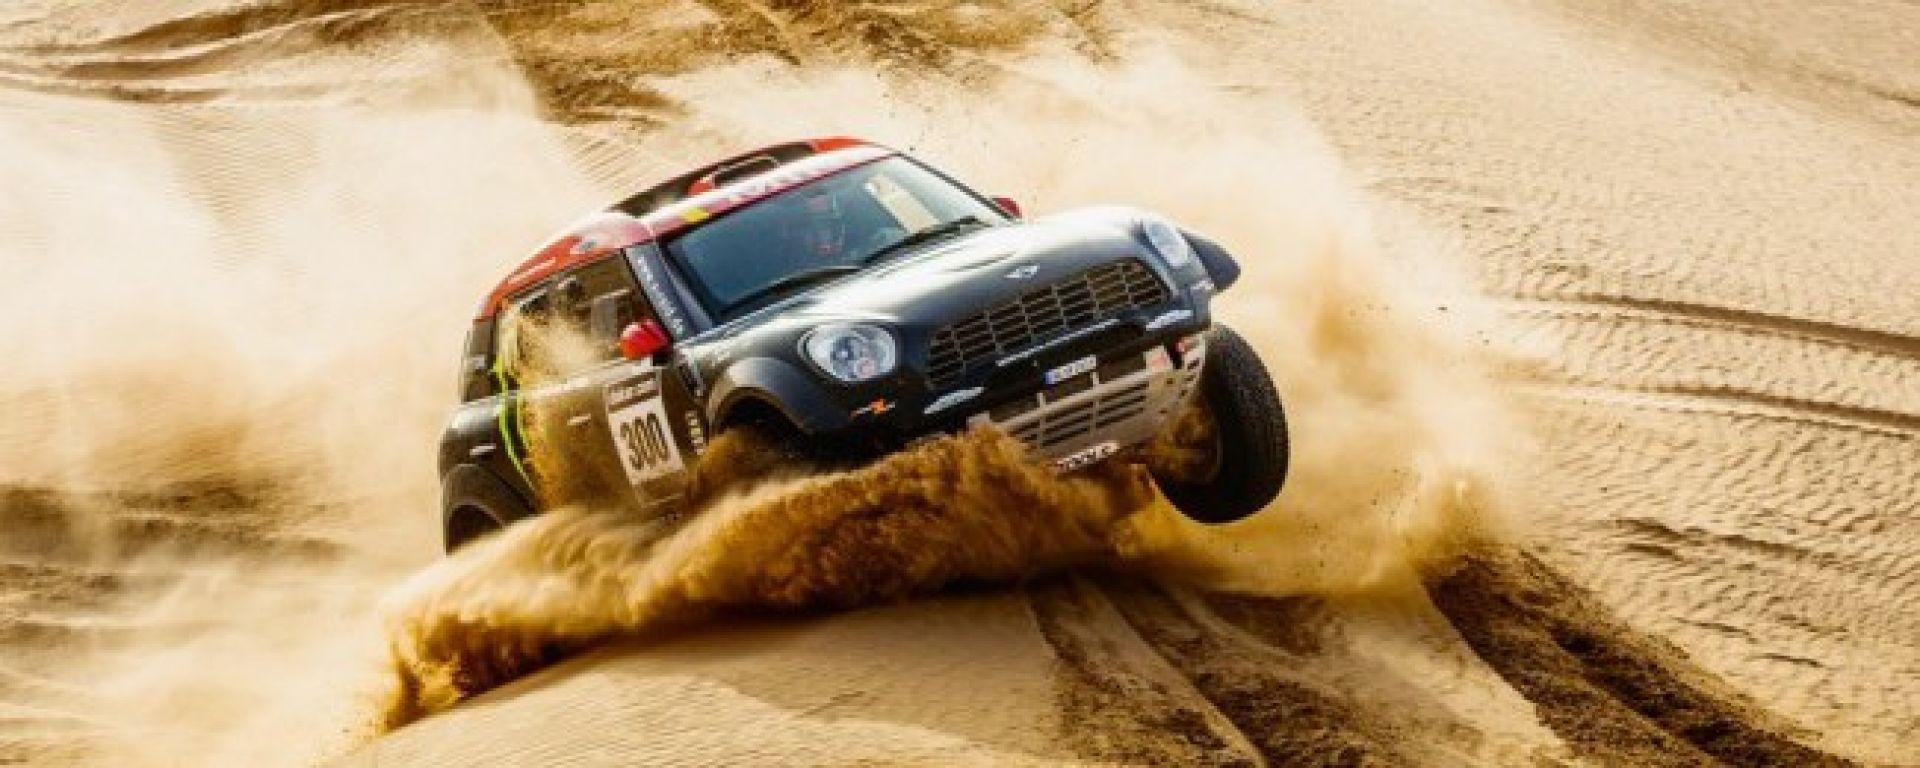 Dakar 2016 - MINI John Cooper Works Rally